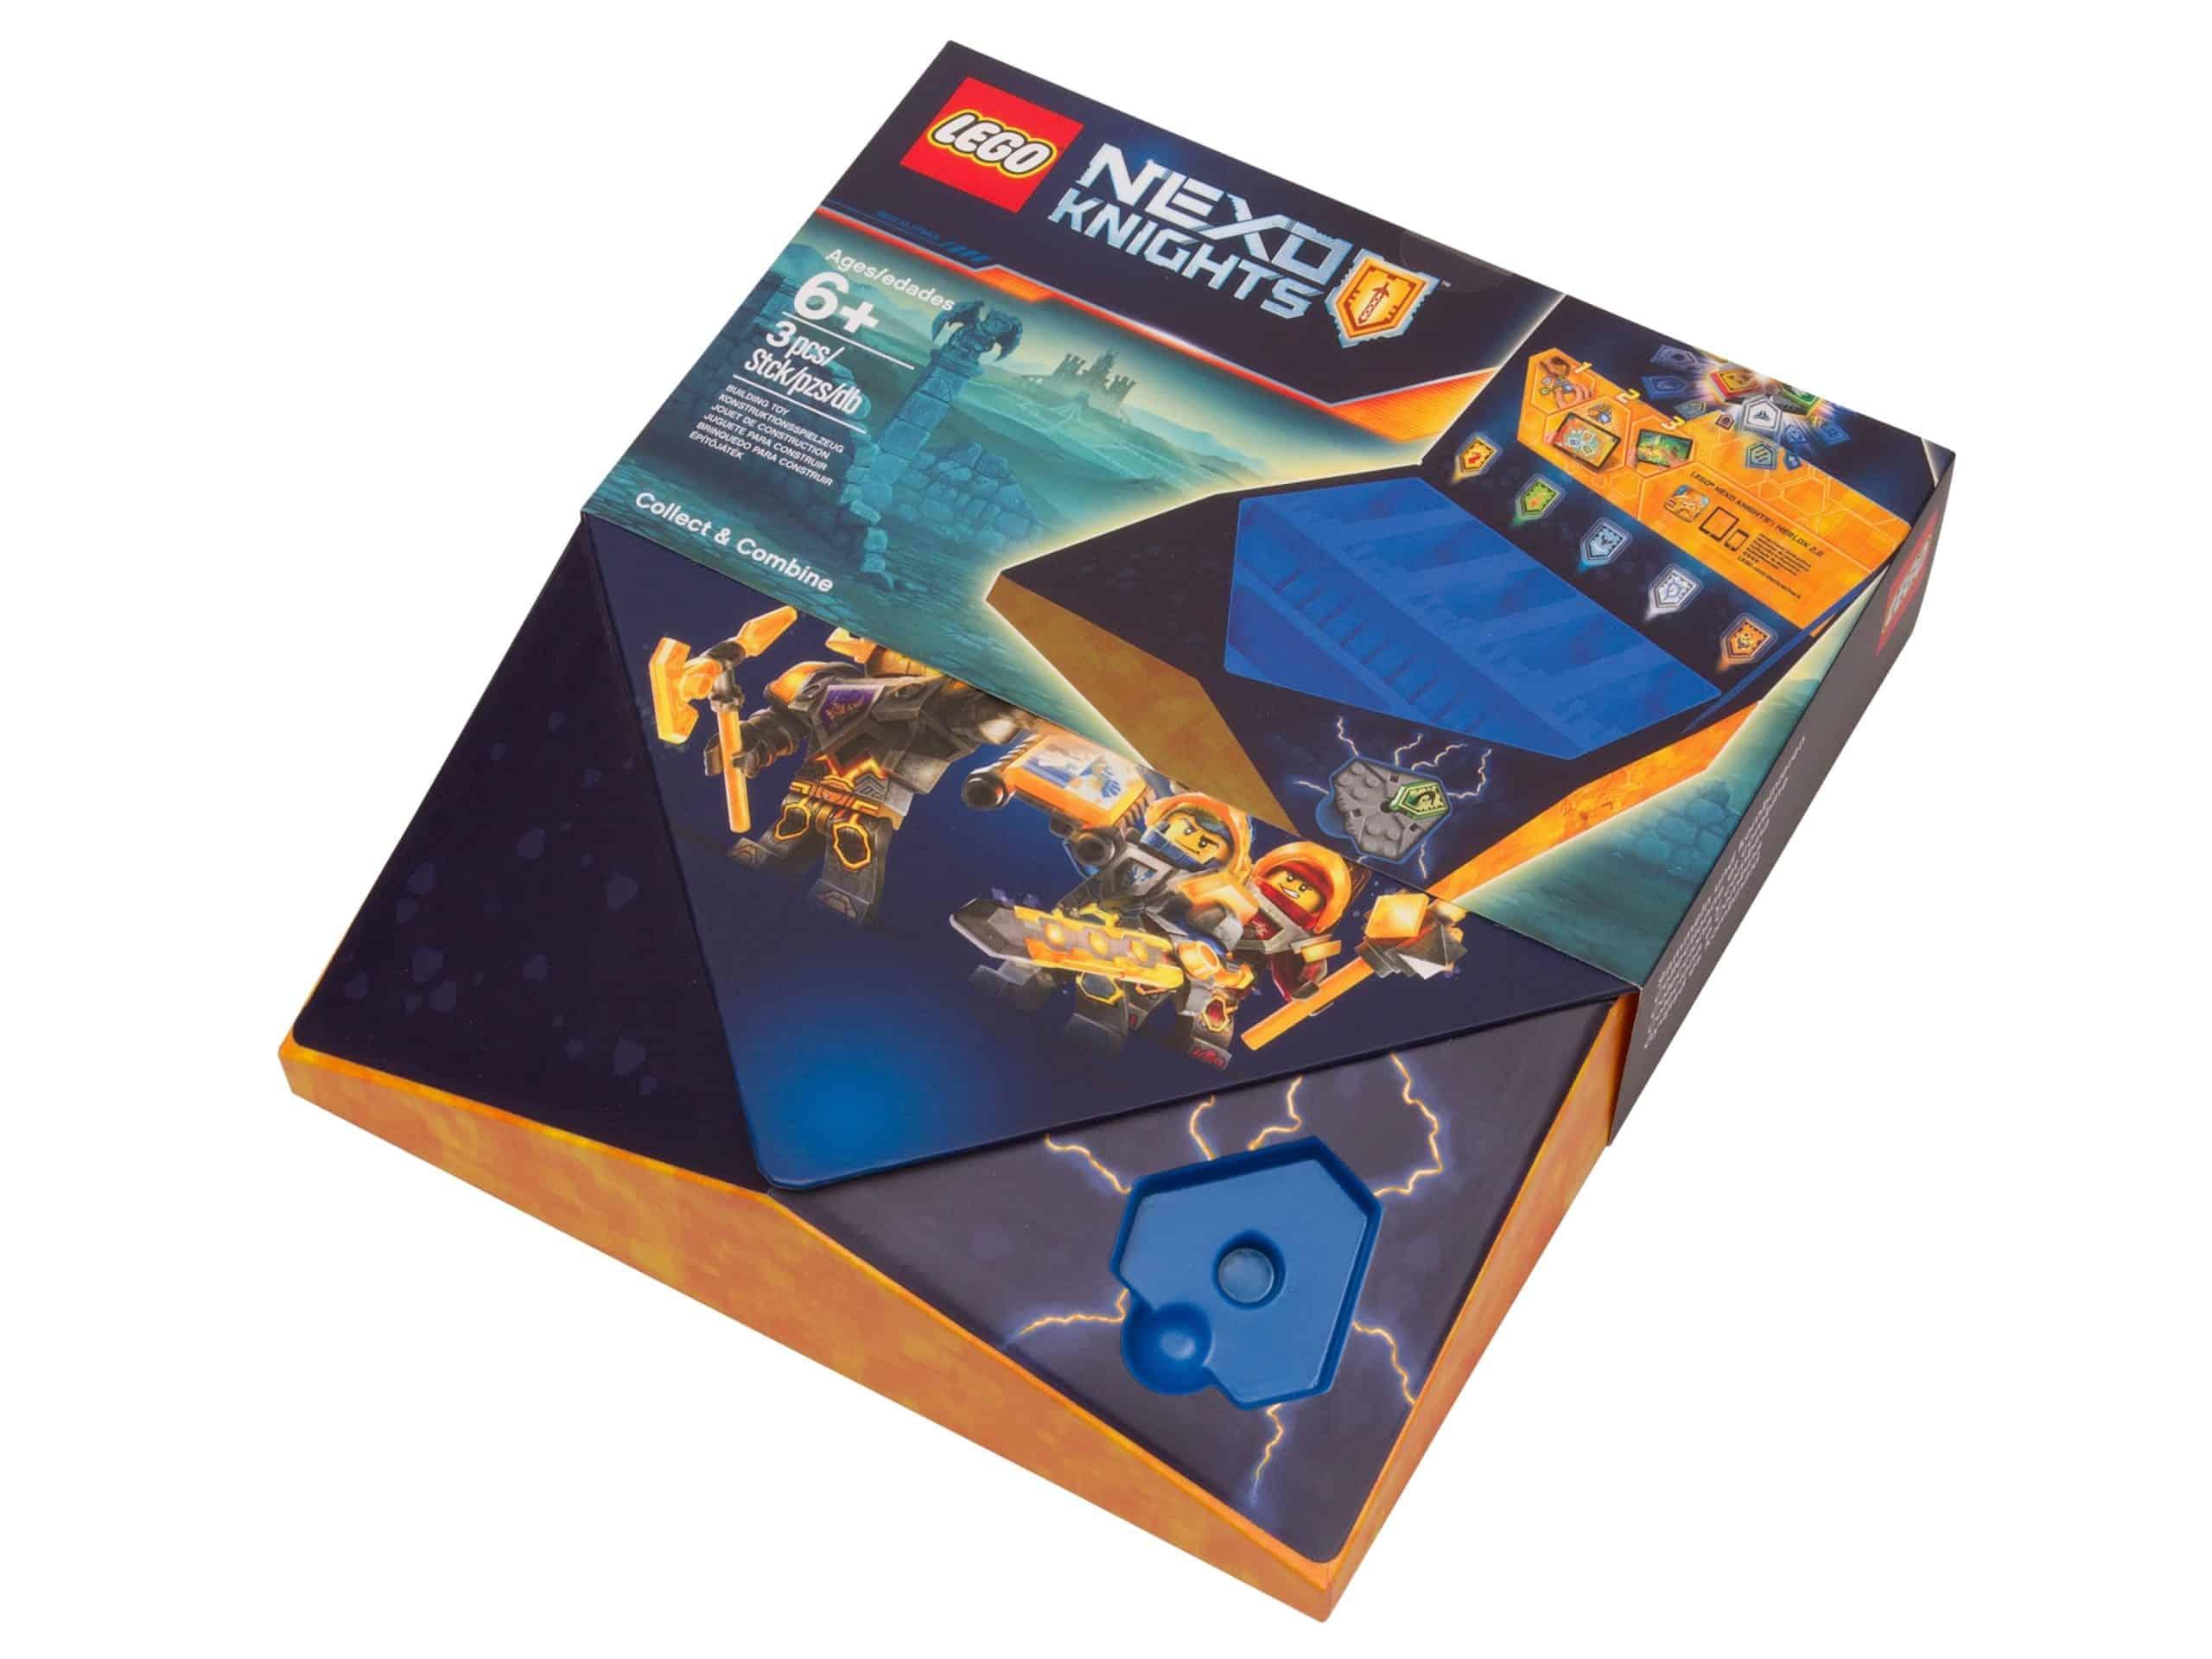 lego 853681 nexo knights saml og kombiner kombikraefter scaled